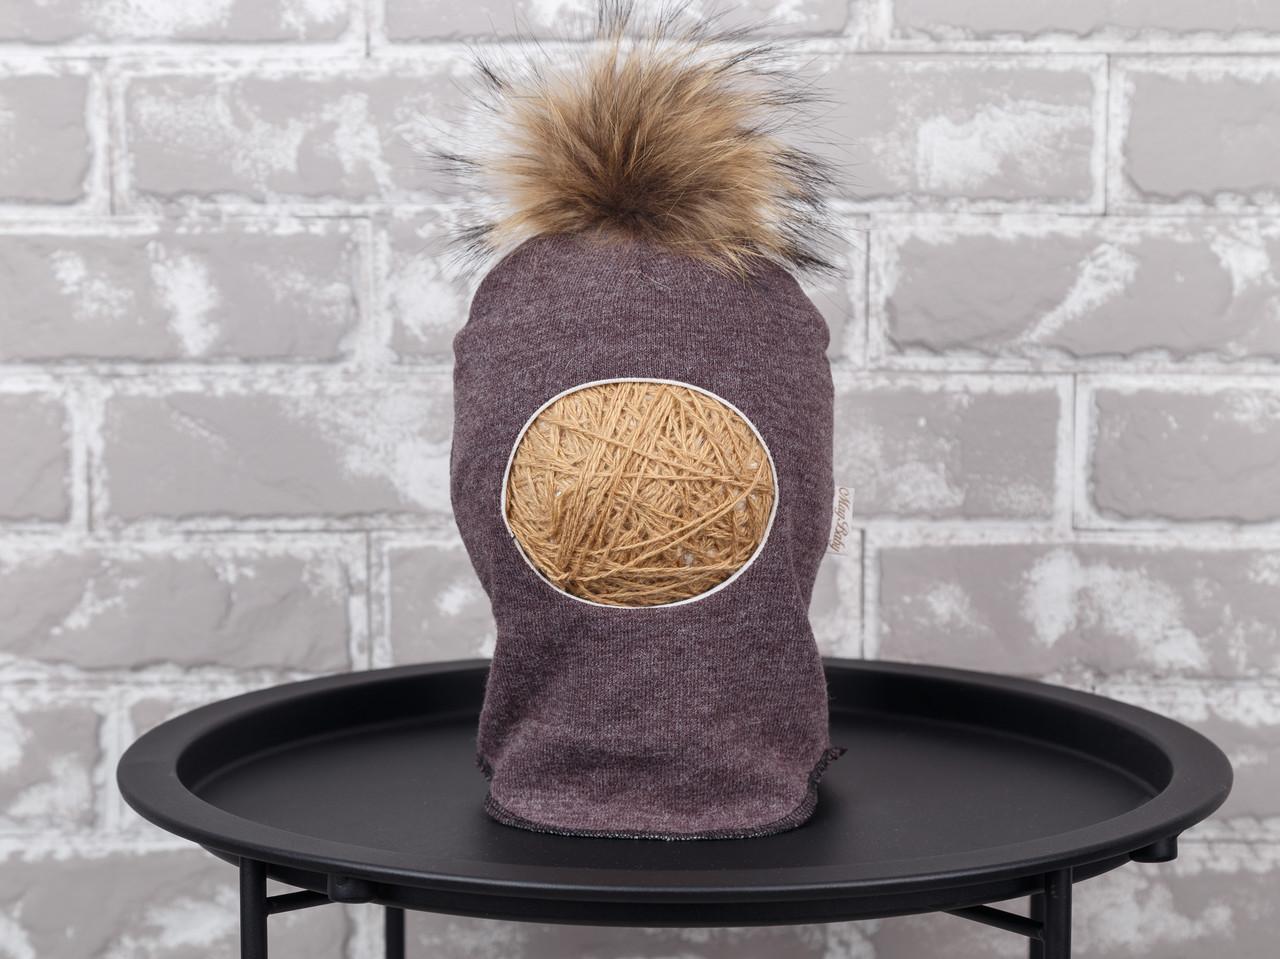 Шапка-шлем с бубоном из чернобурки, коричневый меланж 38-42 (0-6мес.)